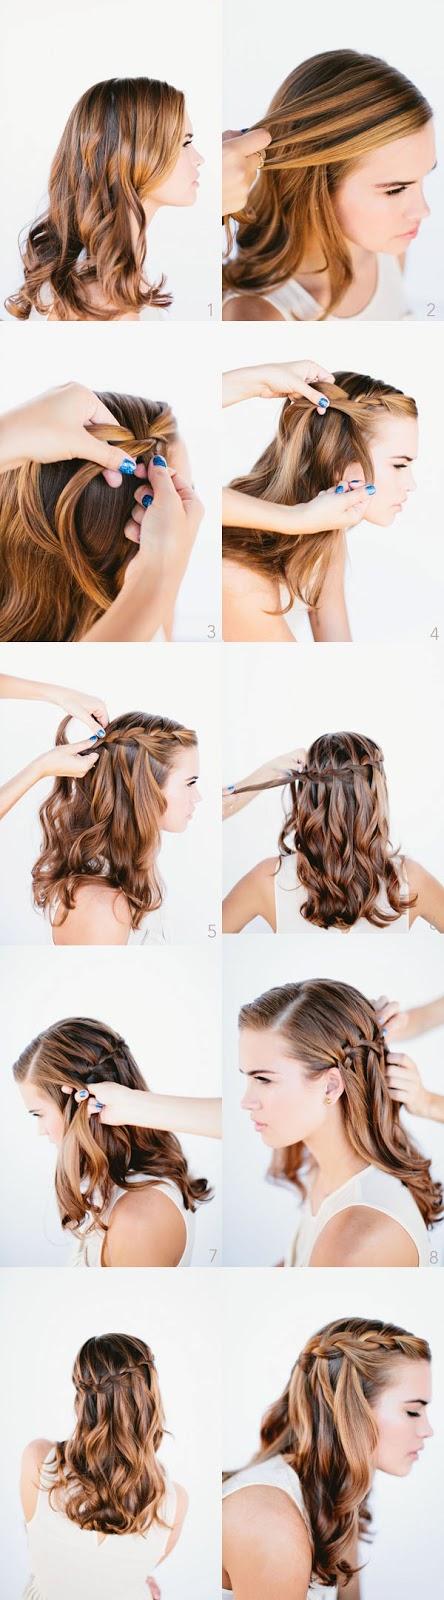 Peinados Faciles Para la Escuela Paso a Paso Peinados Faciles Para la